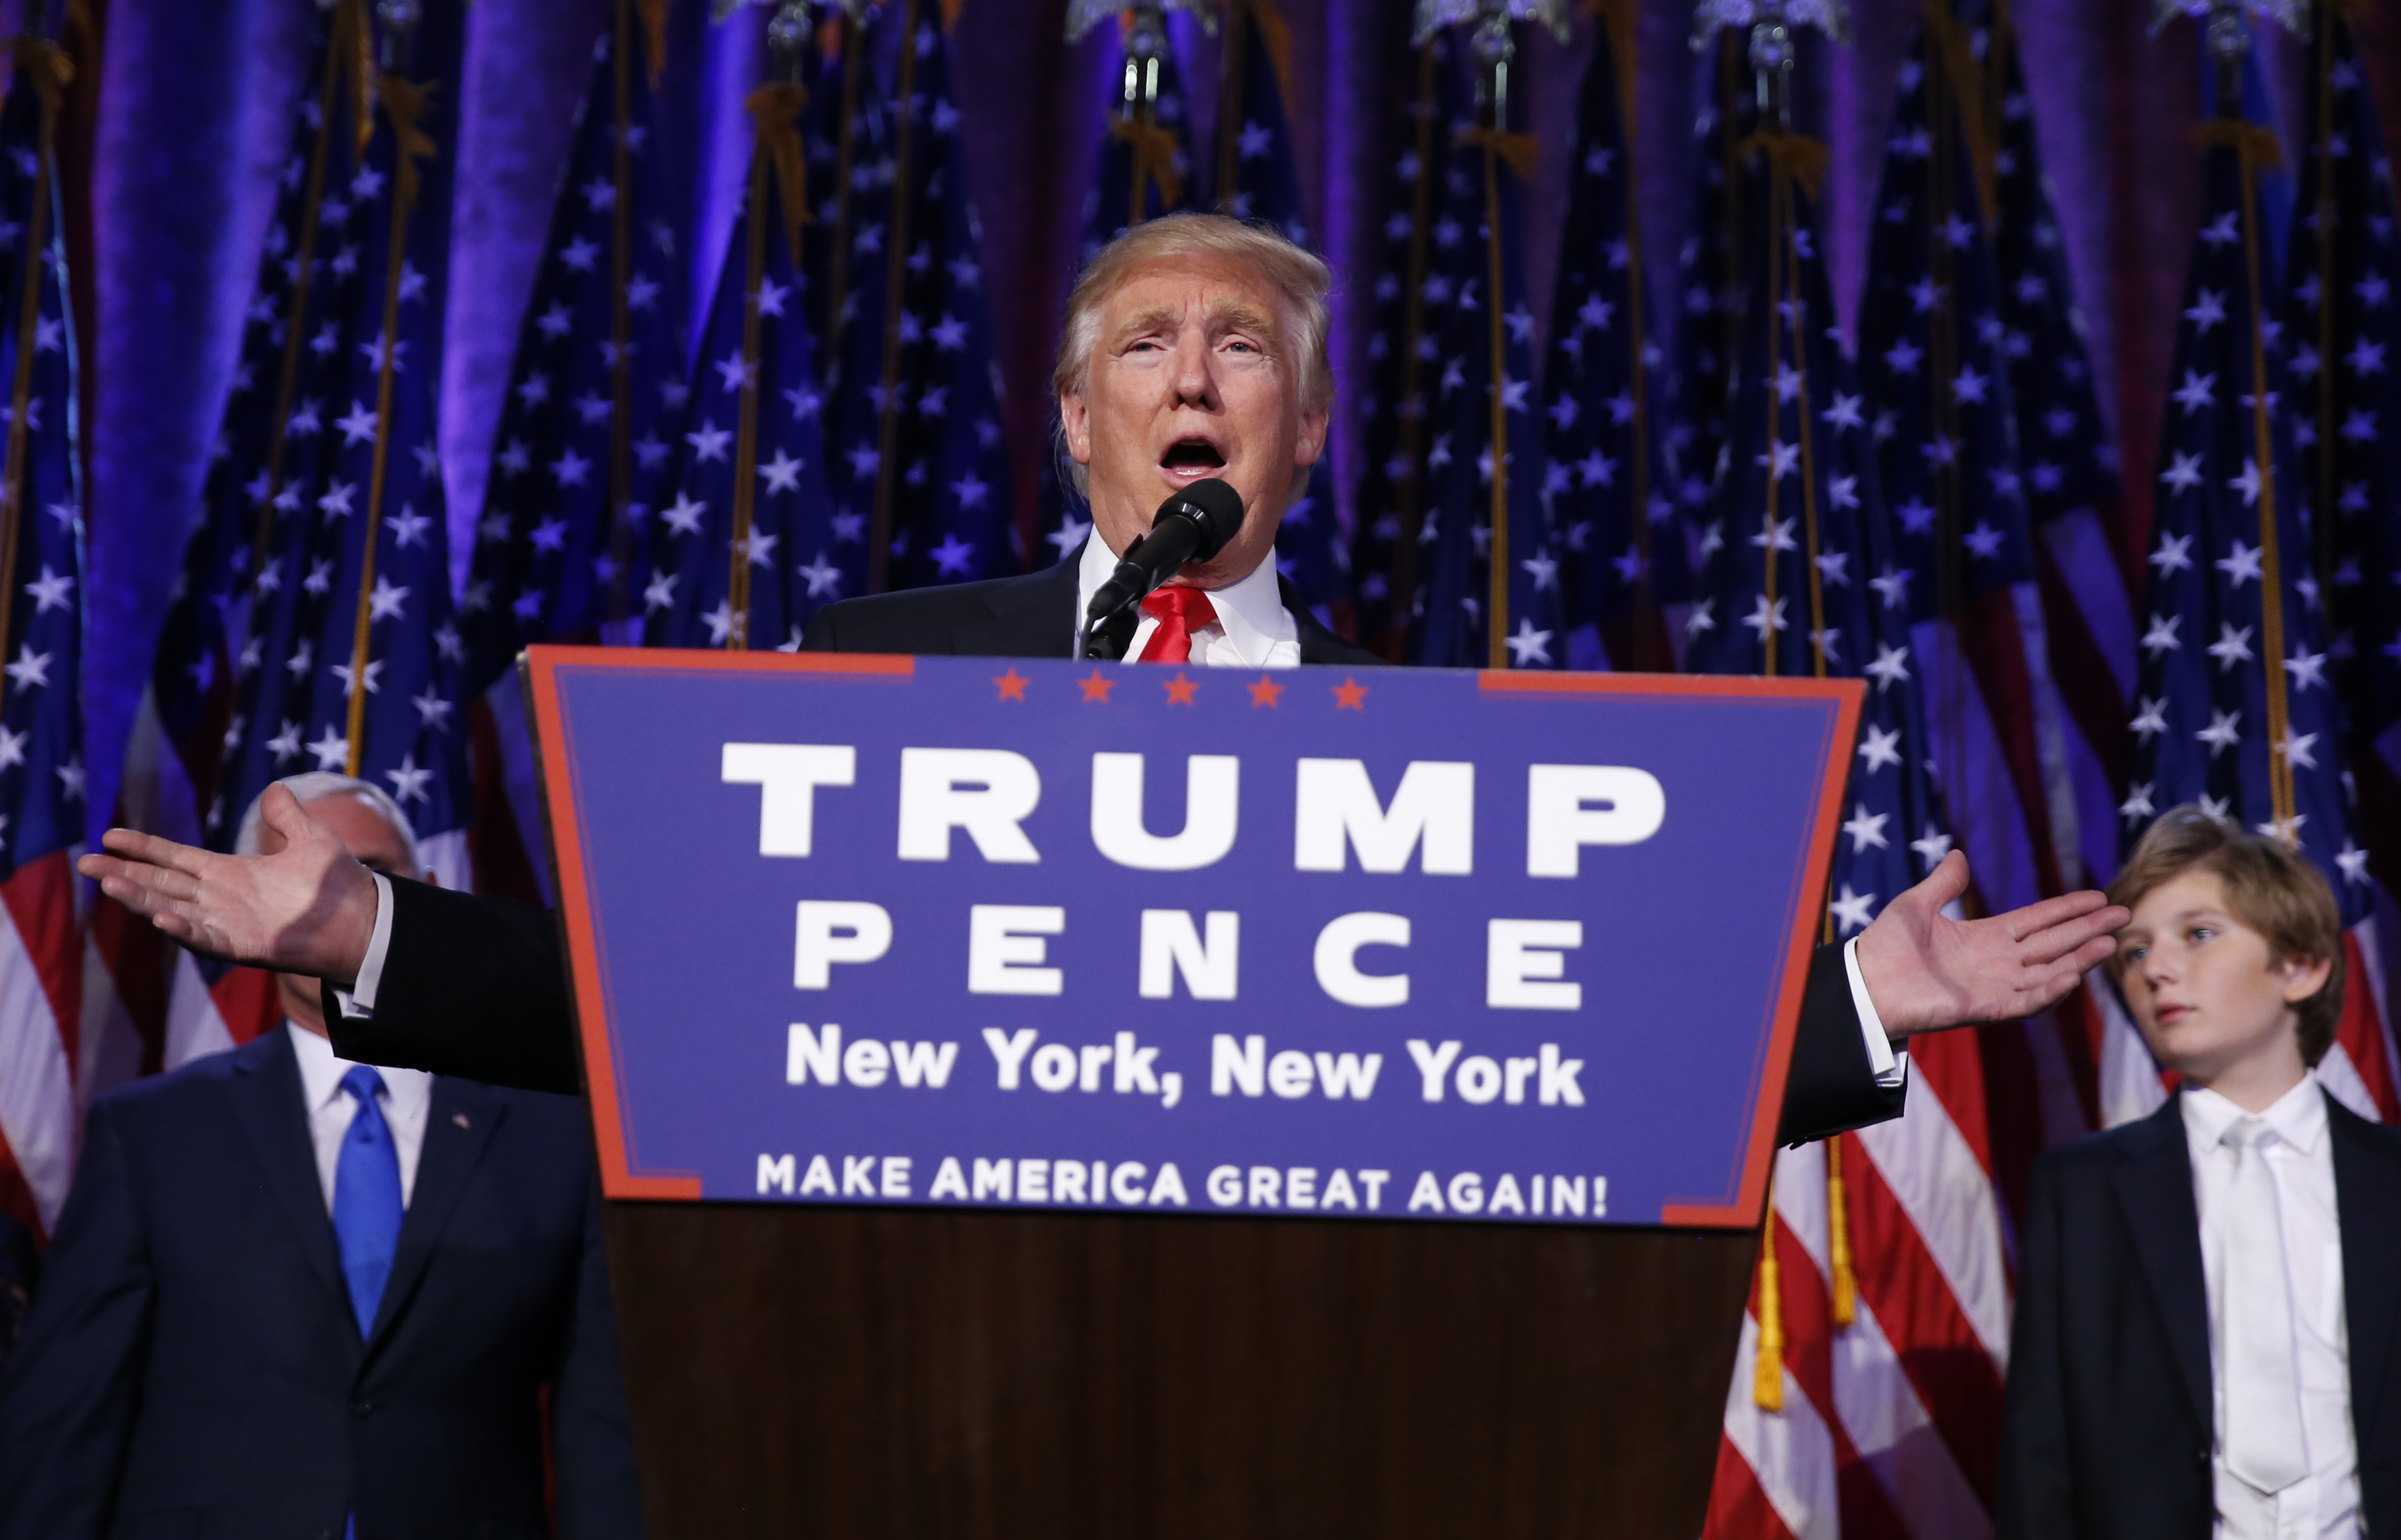 Republican U.S. president-elect Donald Trump speaks at his election night rally in Manhattan, New York, U.S., November 9, 2016. REUTERS/Carlo Allegri  - RTX2SPWK